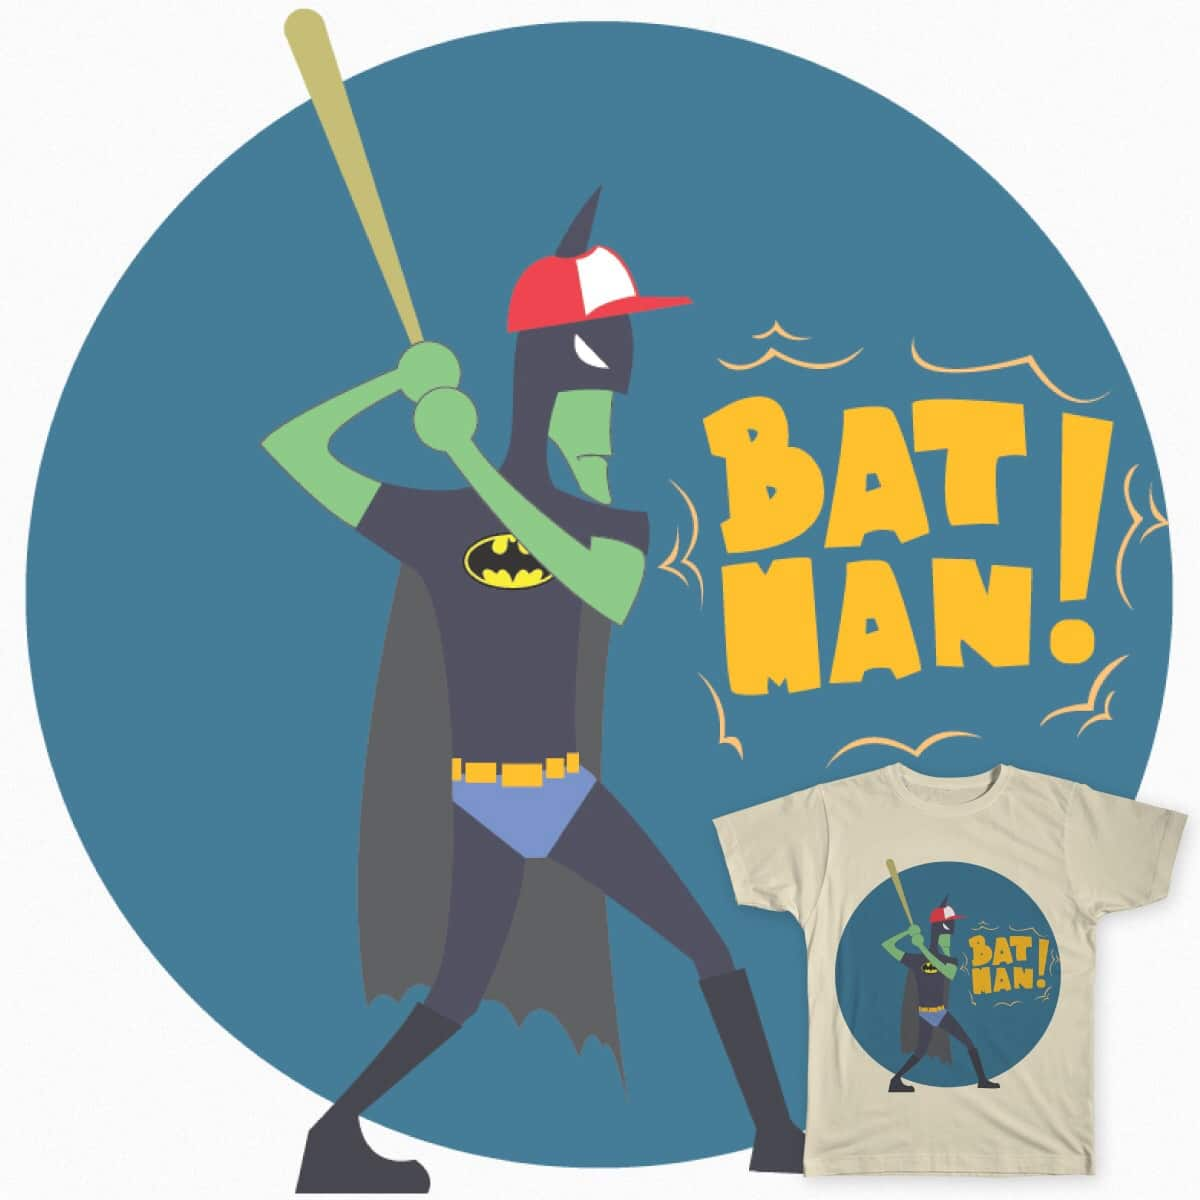 Bat-man by KevinGoreeba on Threadless